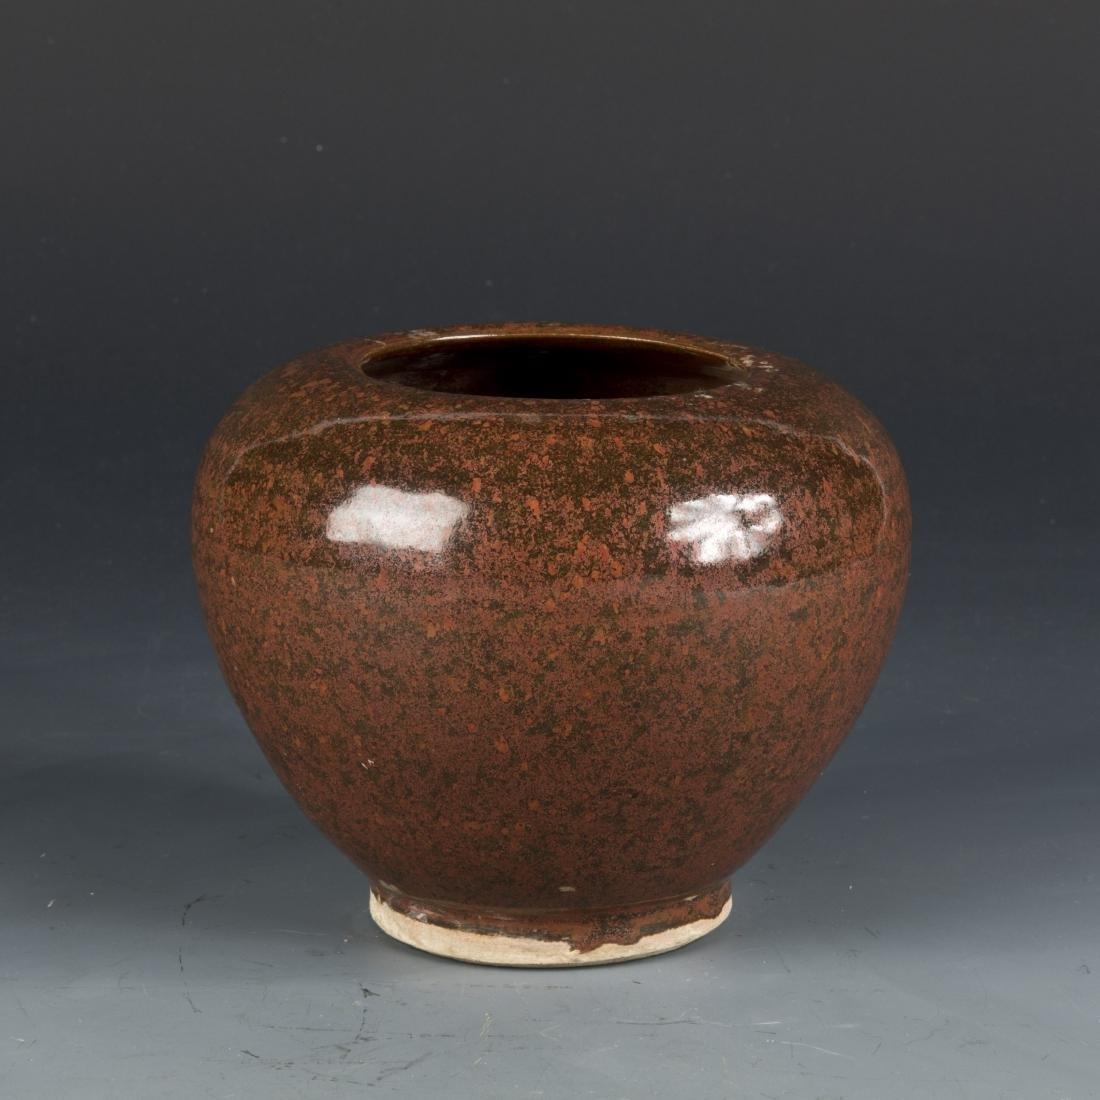 EEL-YELLOW-GLAZED PORCELAIN JAR